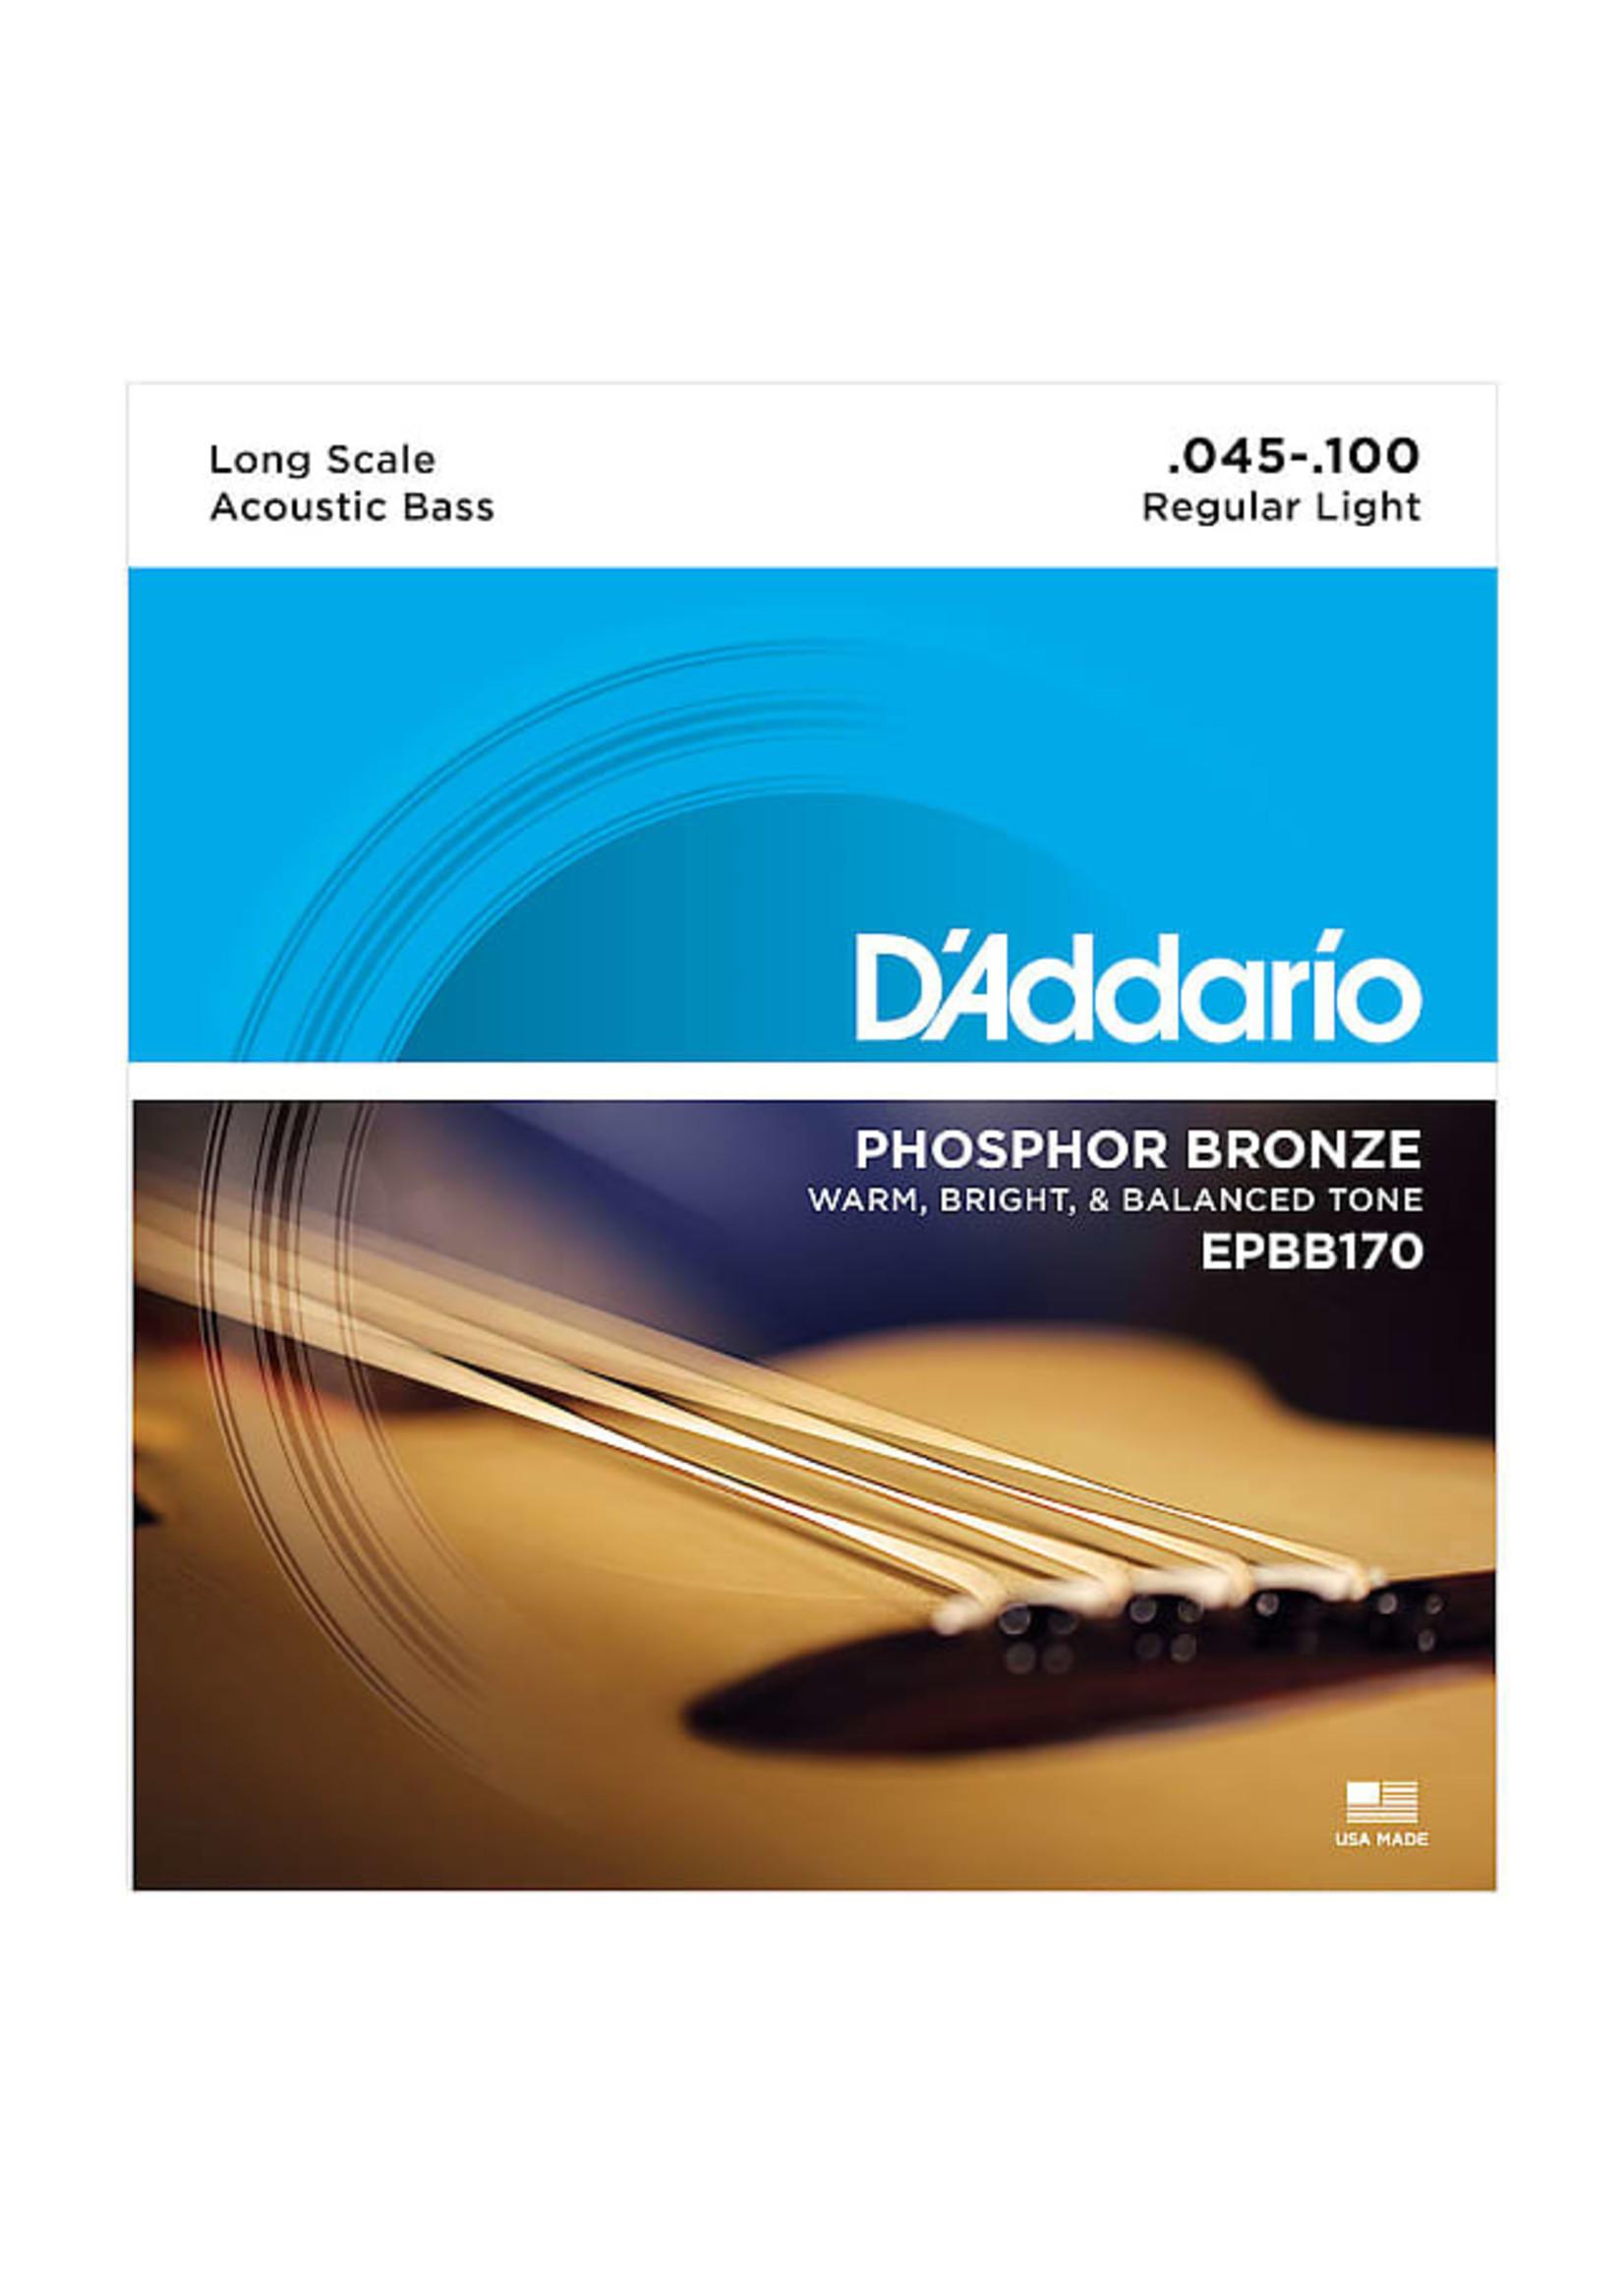 D'Addario D'Addario EPBB170 Phosphor Bronze Acoustic Bass, Long Scale, 45-100